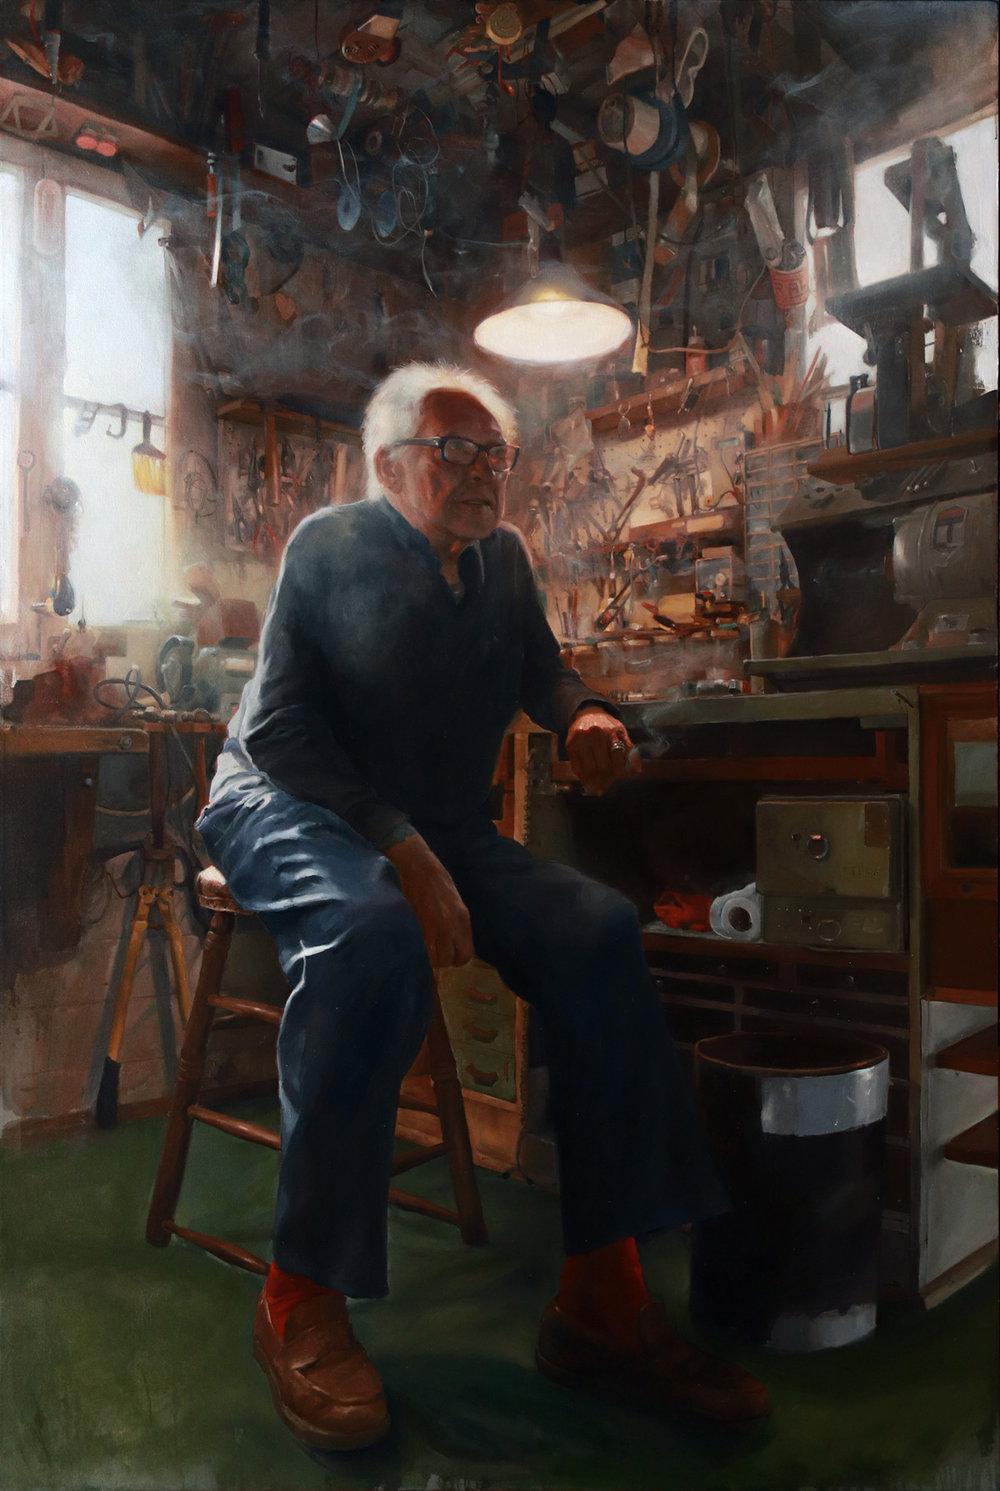 "'Portrait of the Artist, Lyle Tuttle, in his Workshop, Ukiah, CA', oil on canvas, 72"" x 48"", 2018"